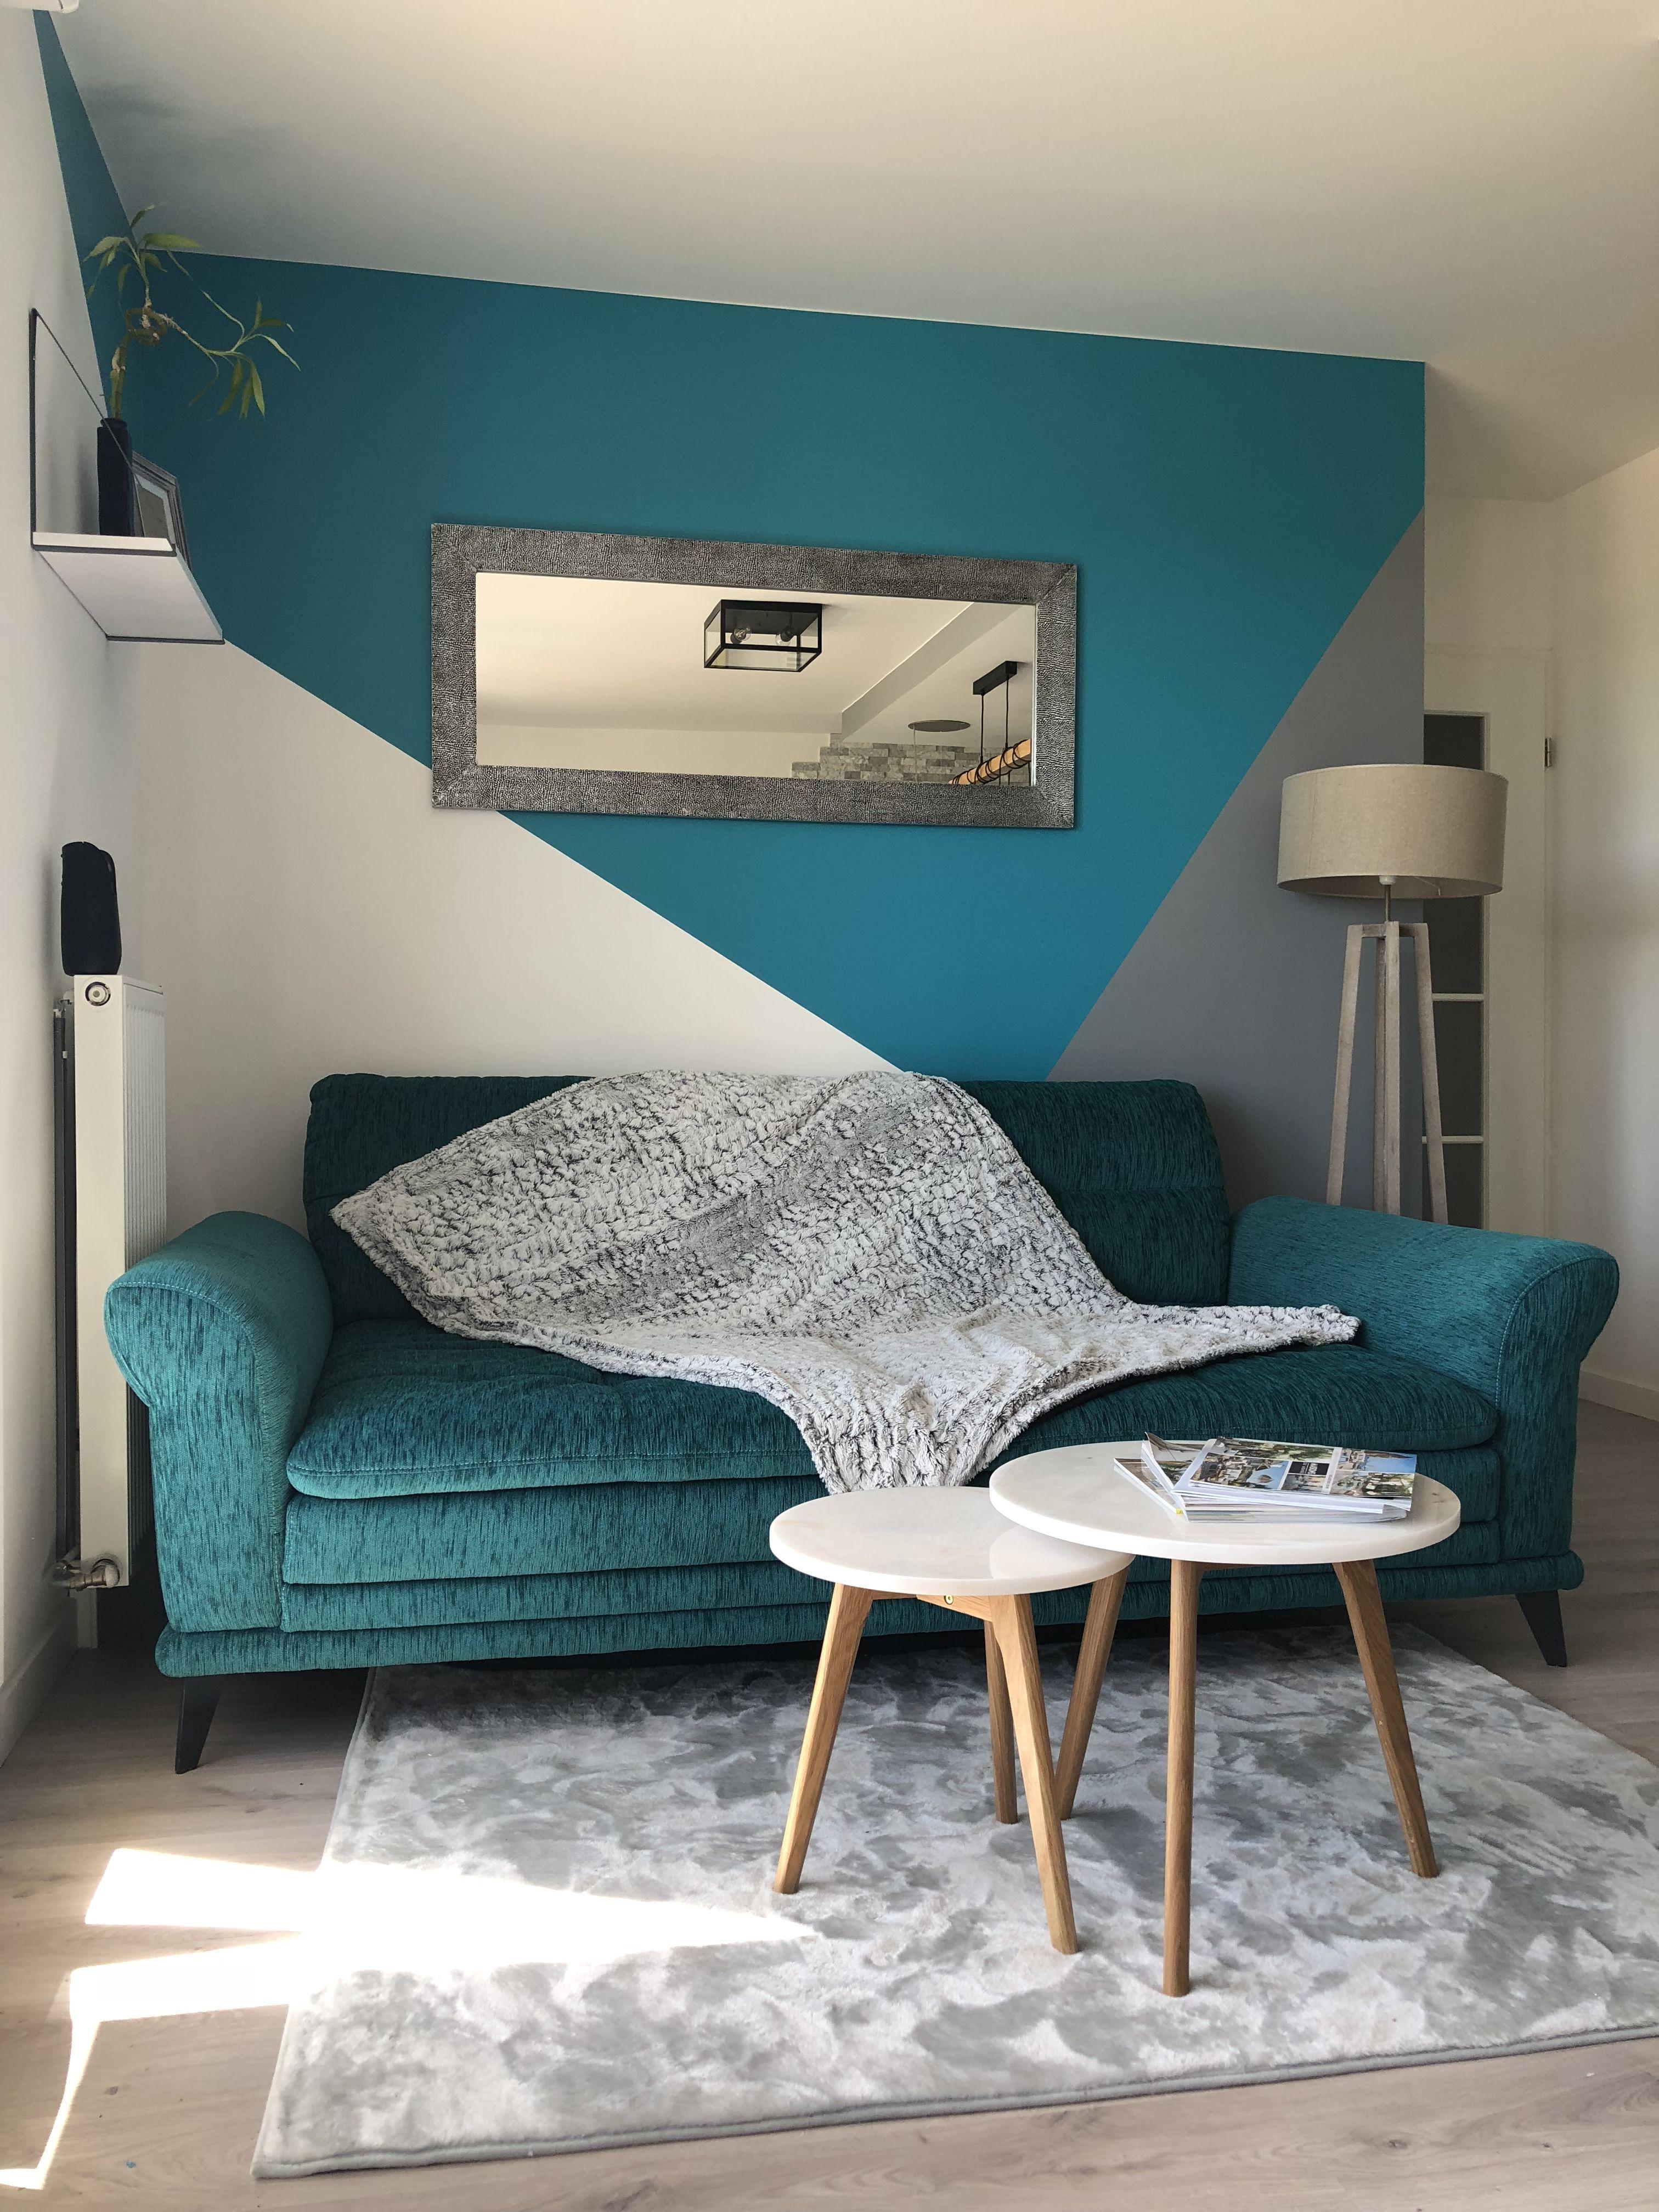 Salon Bleu Gris Deco Chambre Deco Mur Deco Chambre Bleu